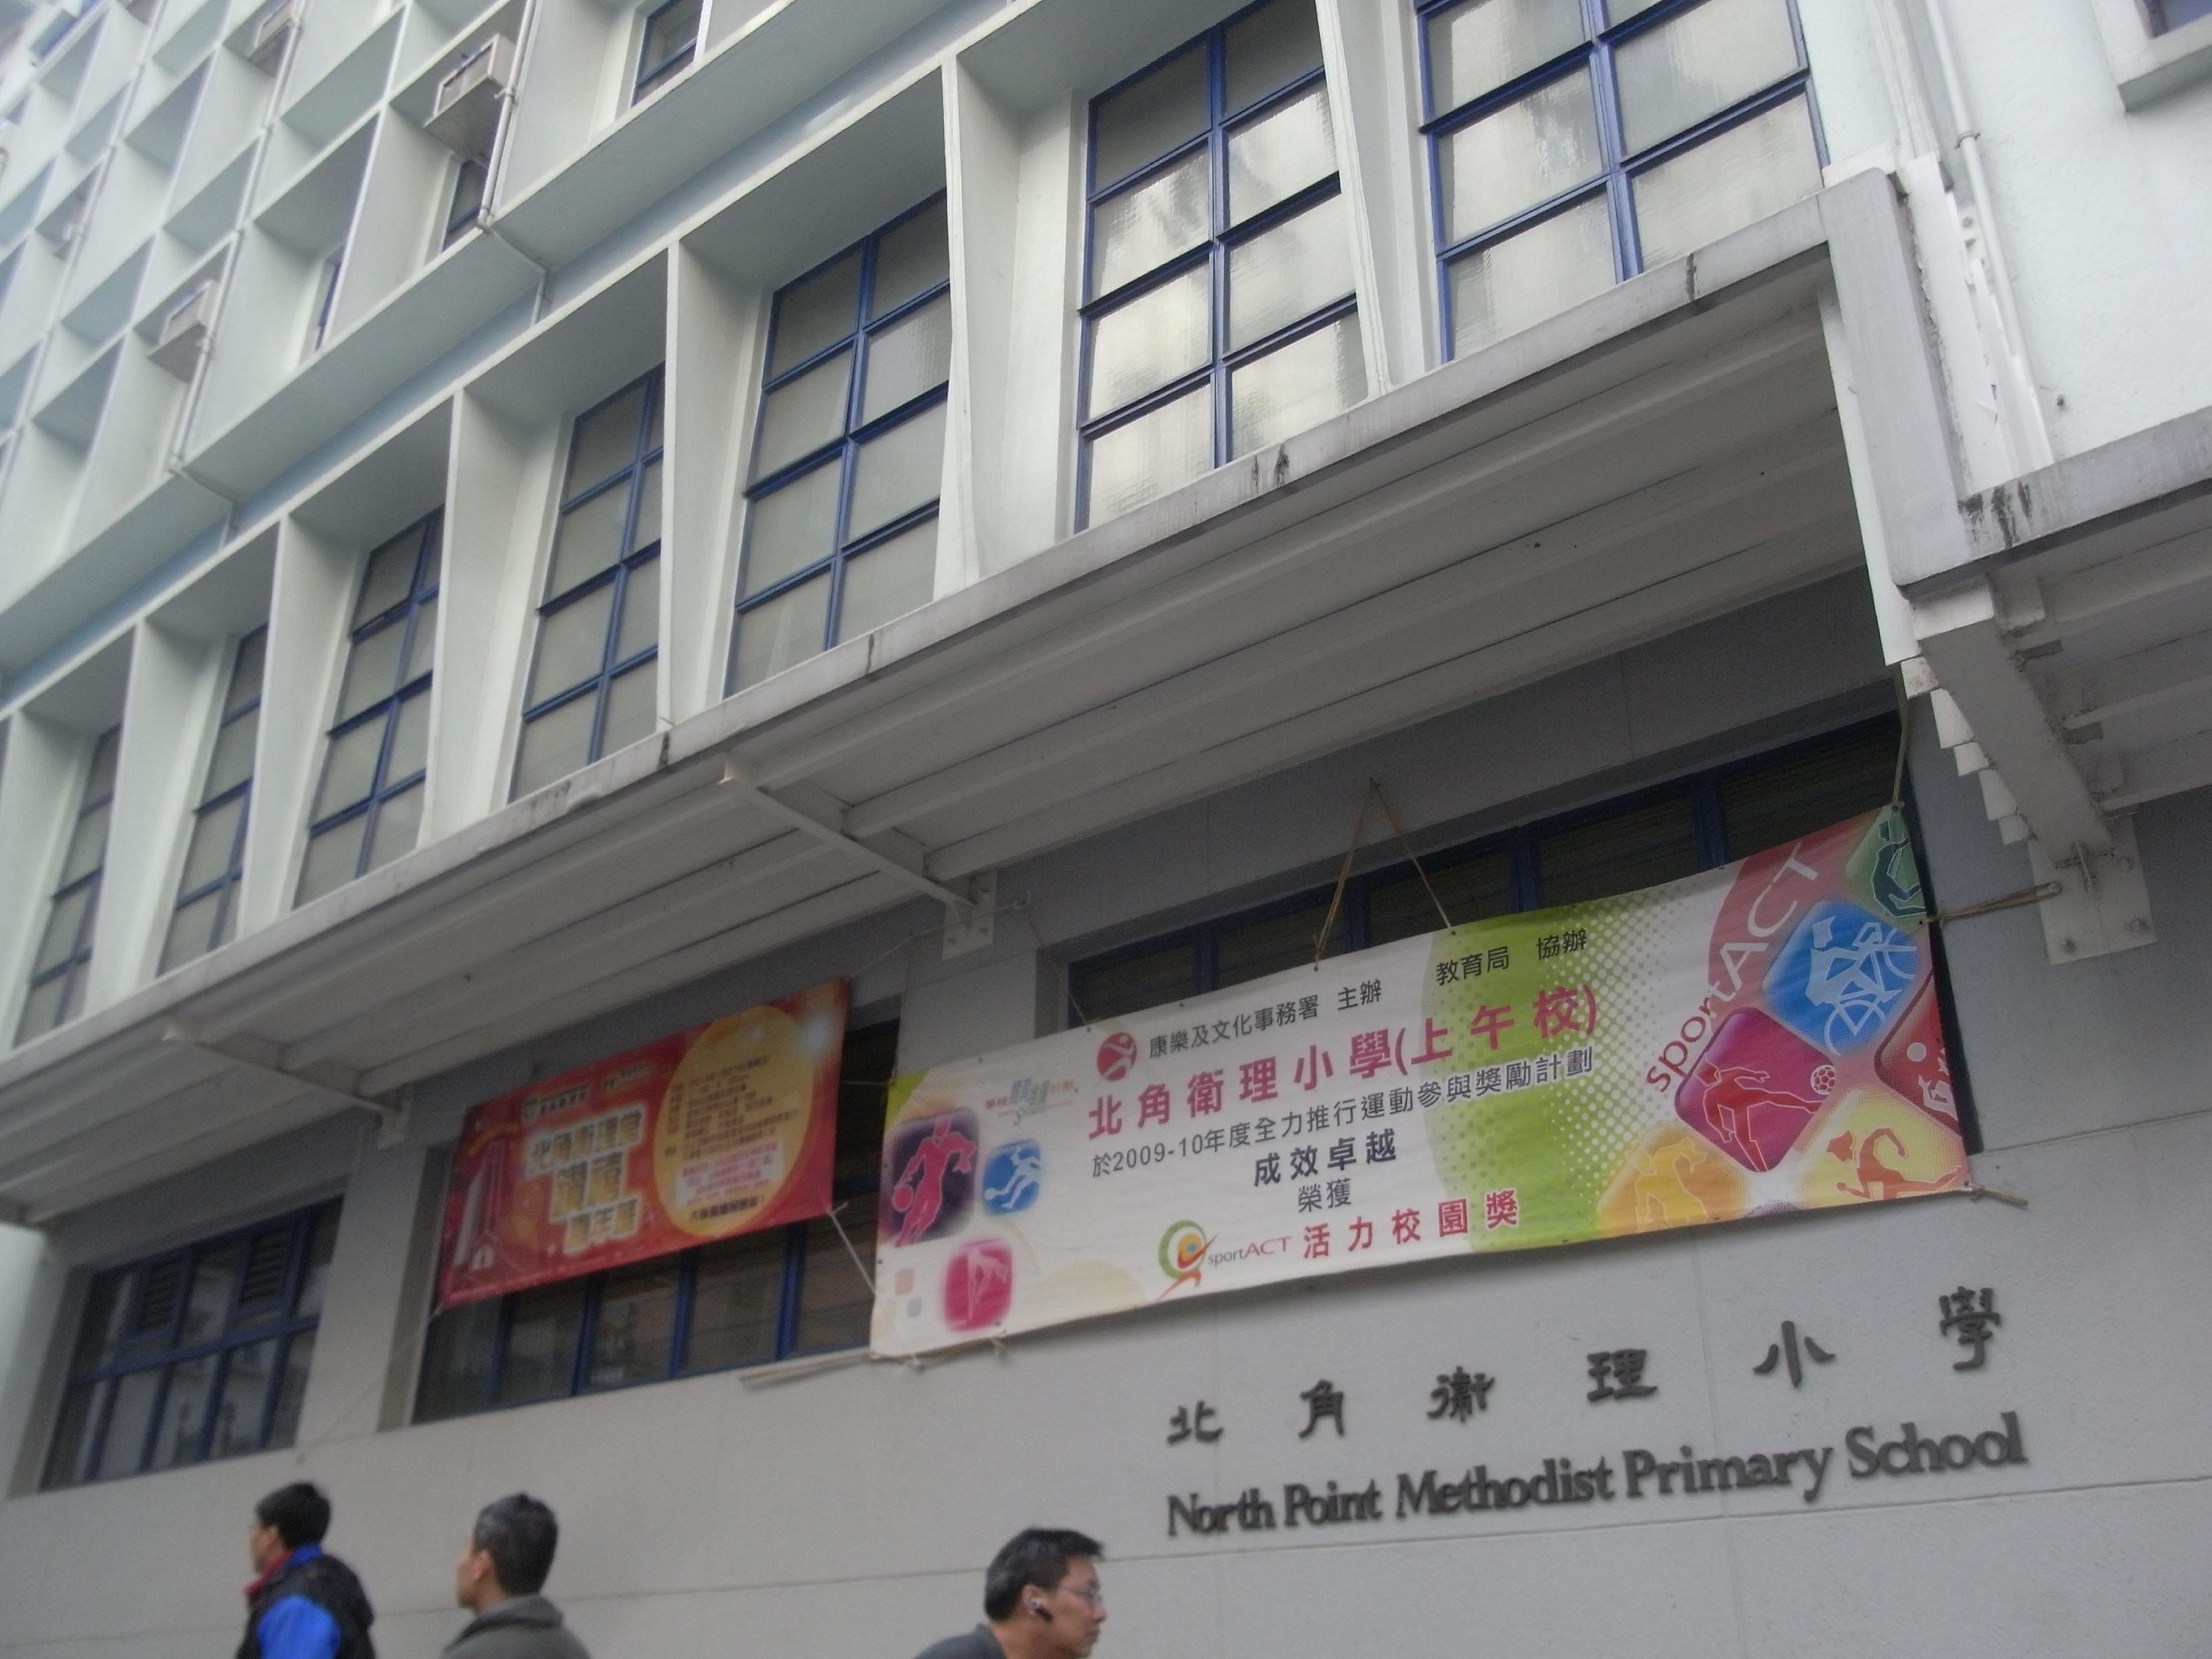 File:HK Fortress 長康街 Cheung Hong Street 北角衞理小學 North Point Methodist Primary School Jan-2013.JPG - Wikimedia Commons